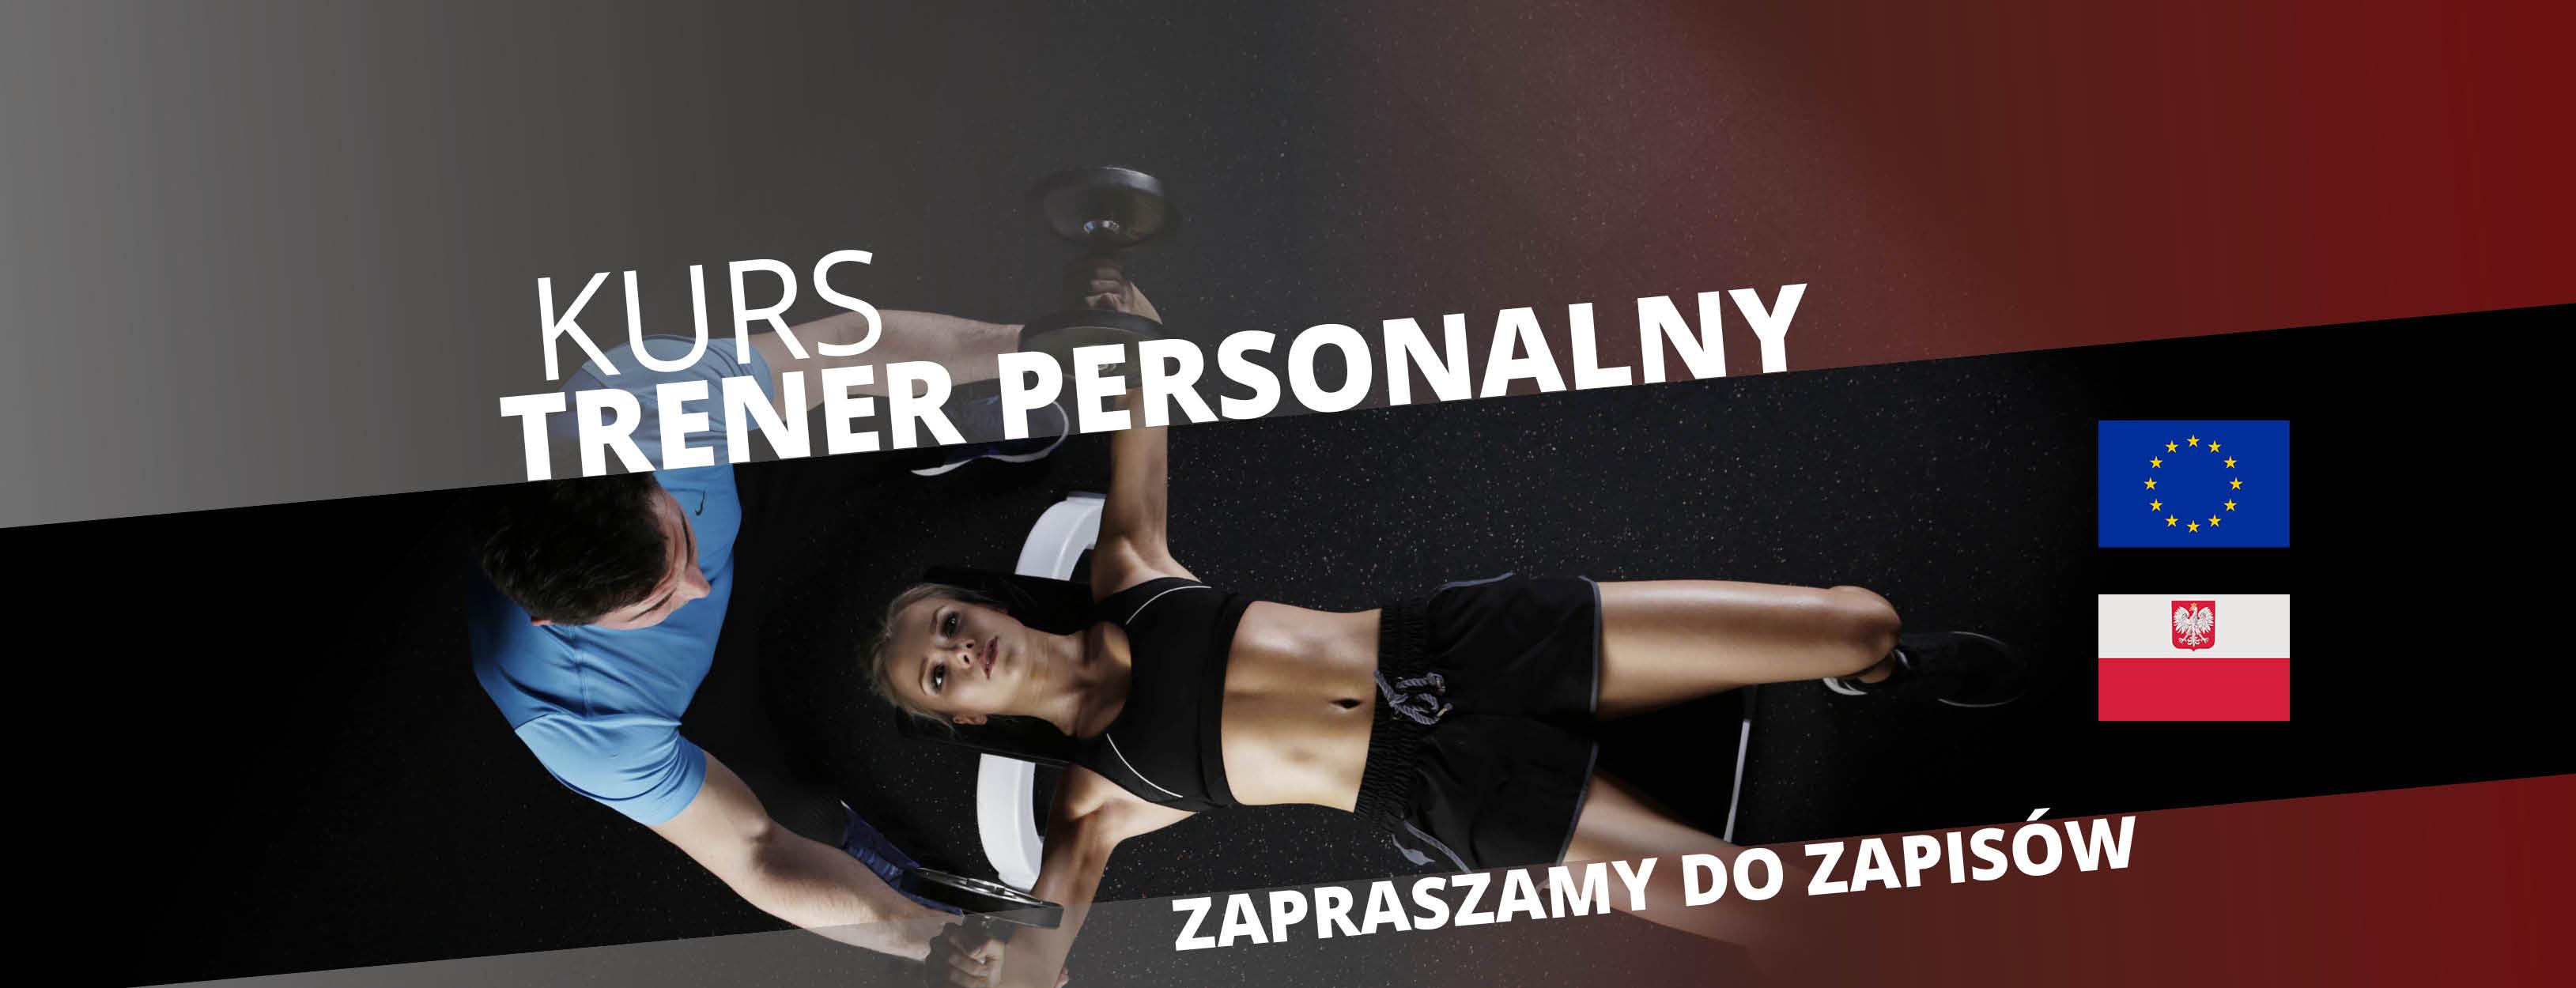 ATS_baner-www-_kurs-trener